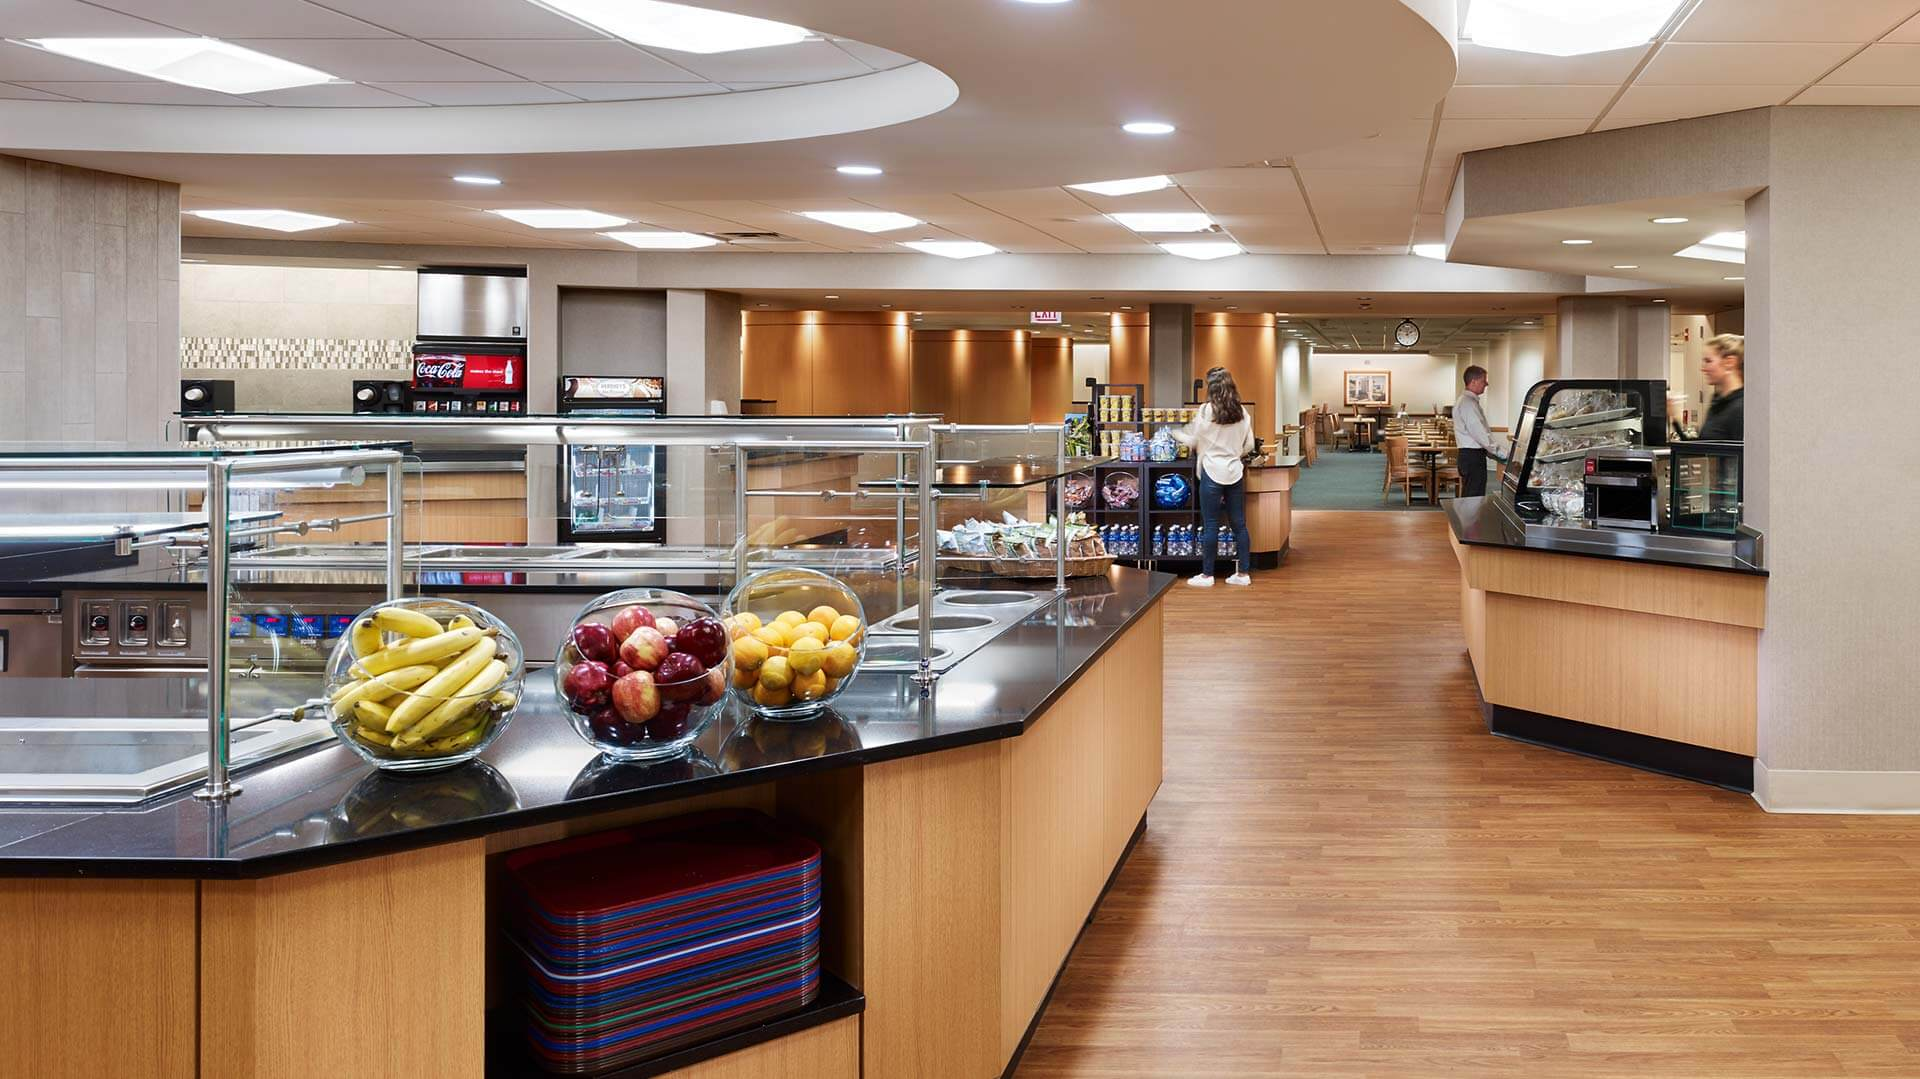 NorthShore University Health System CafeteriasNorthShore University Health System Cafeterias